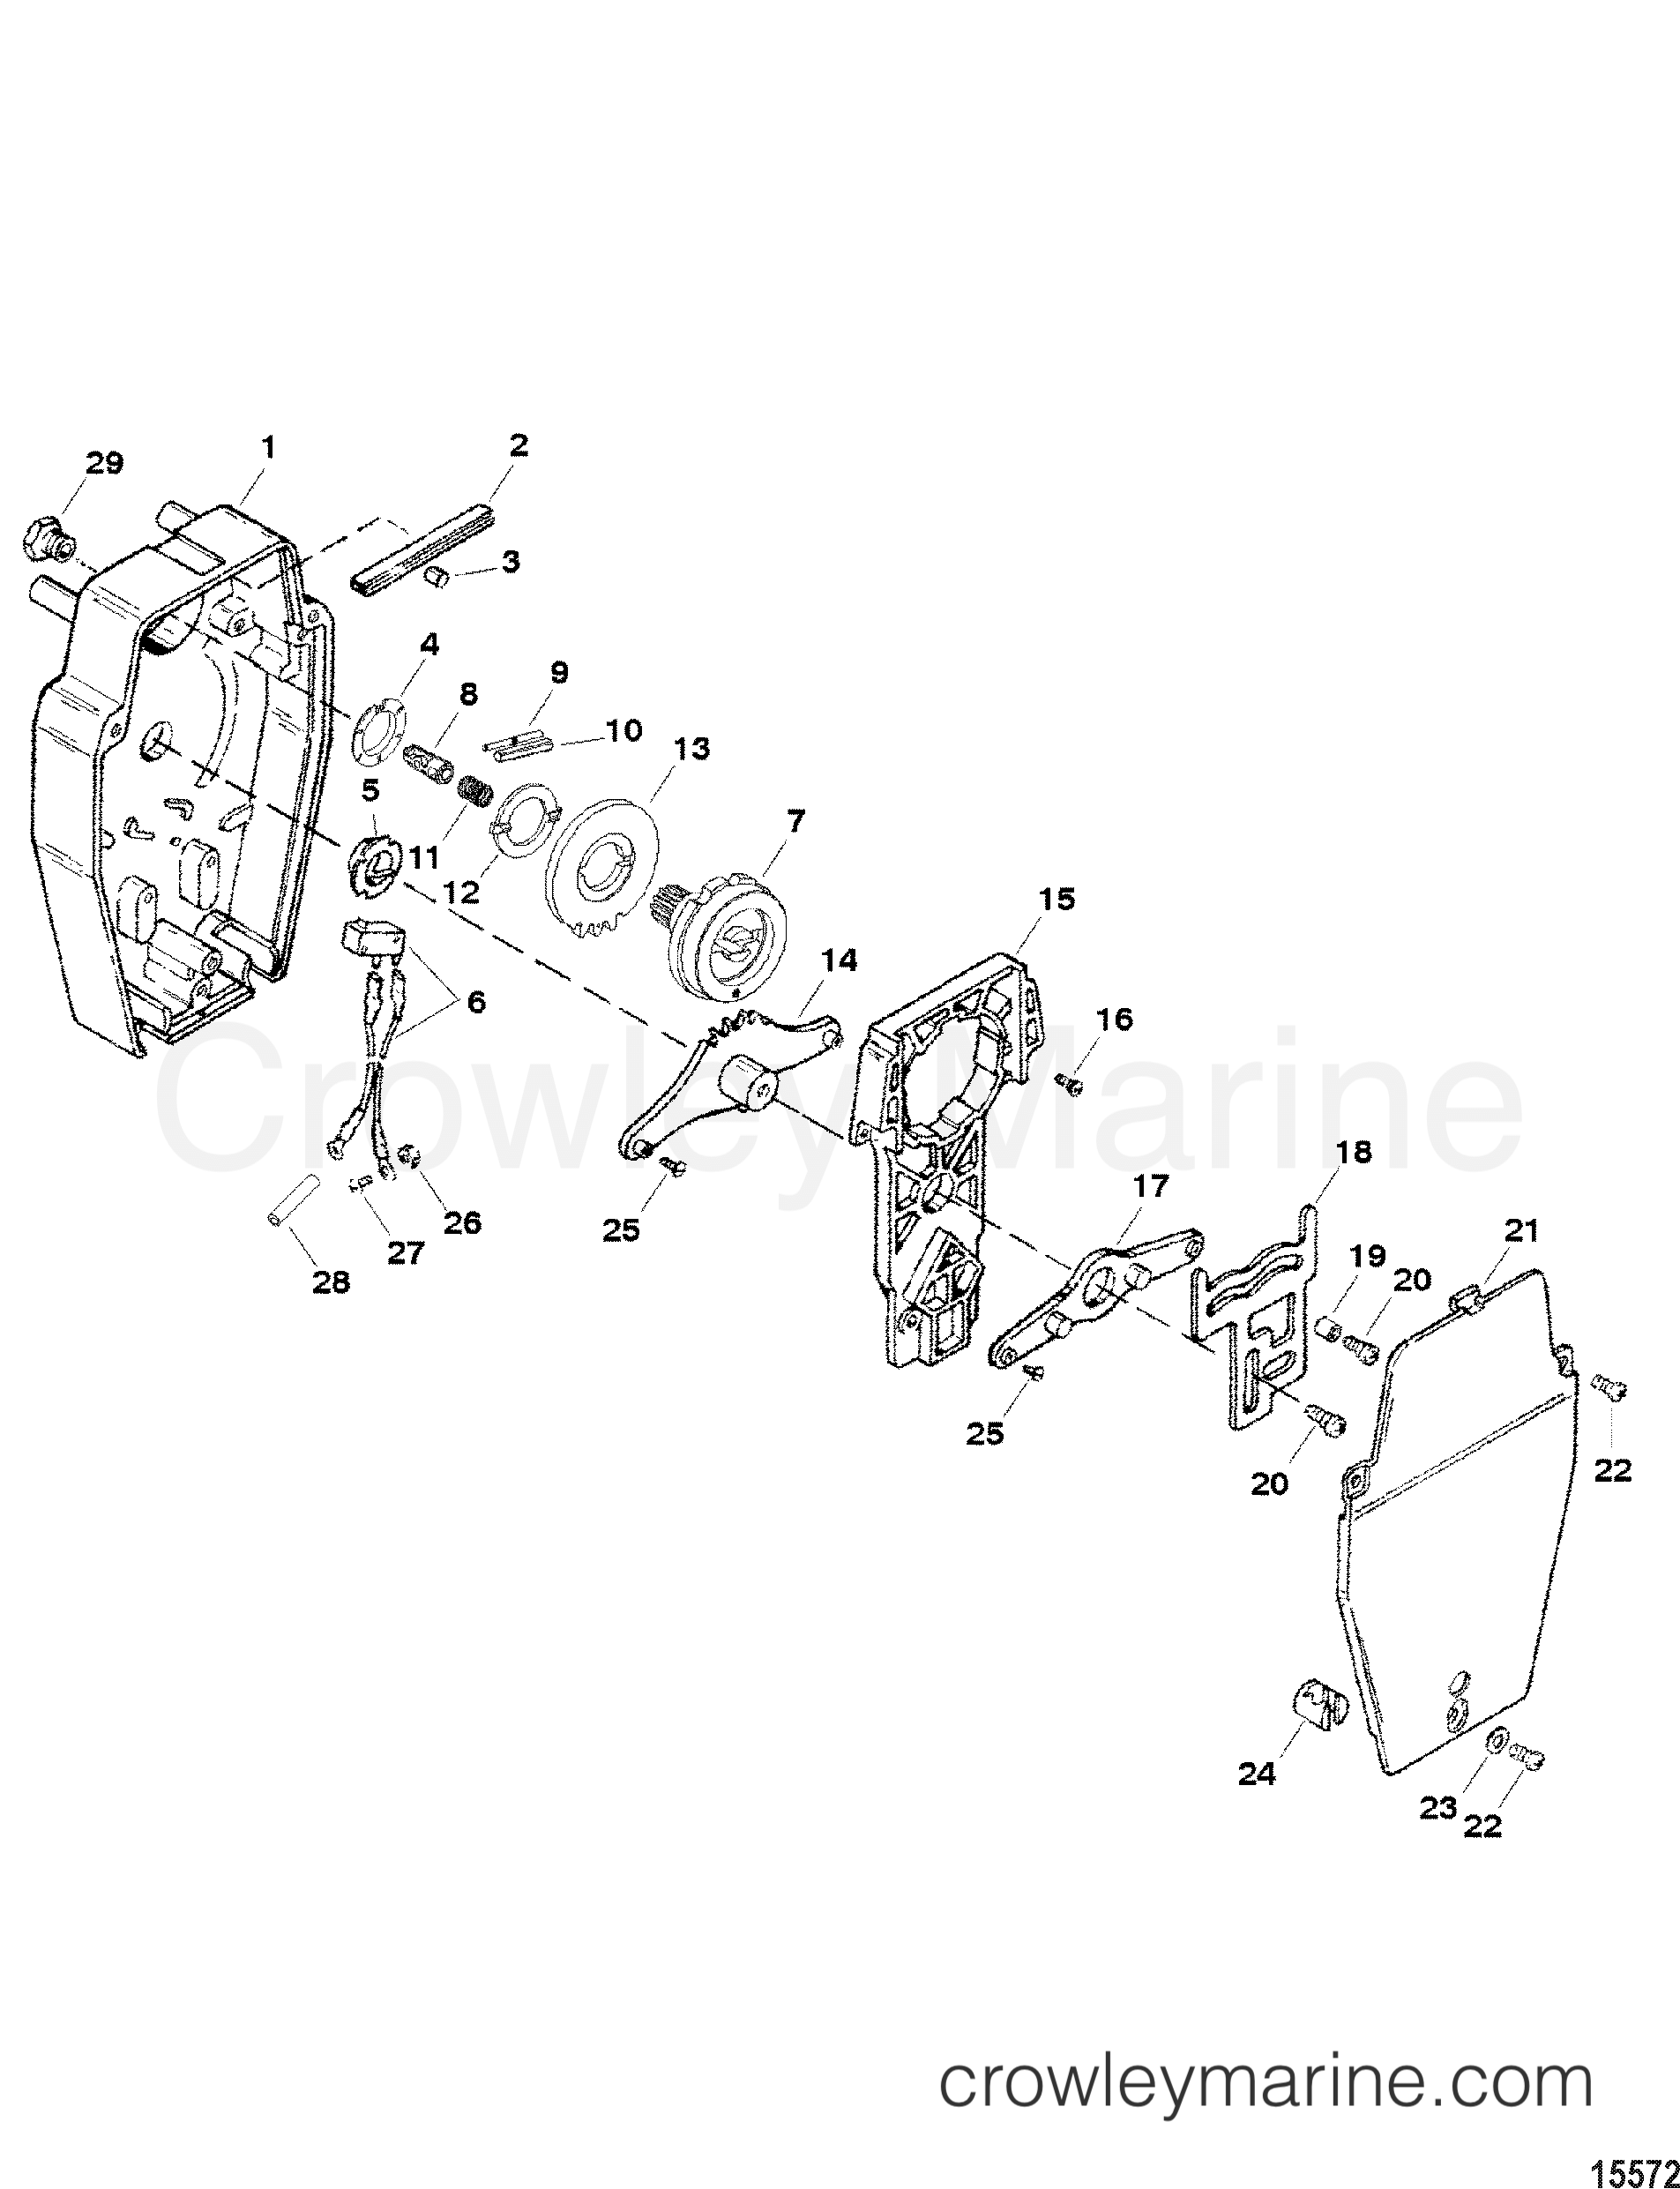 modular components design iii